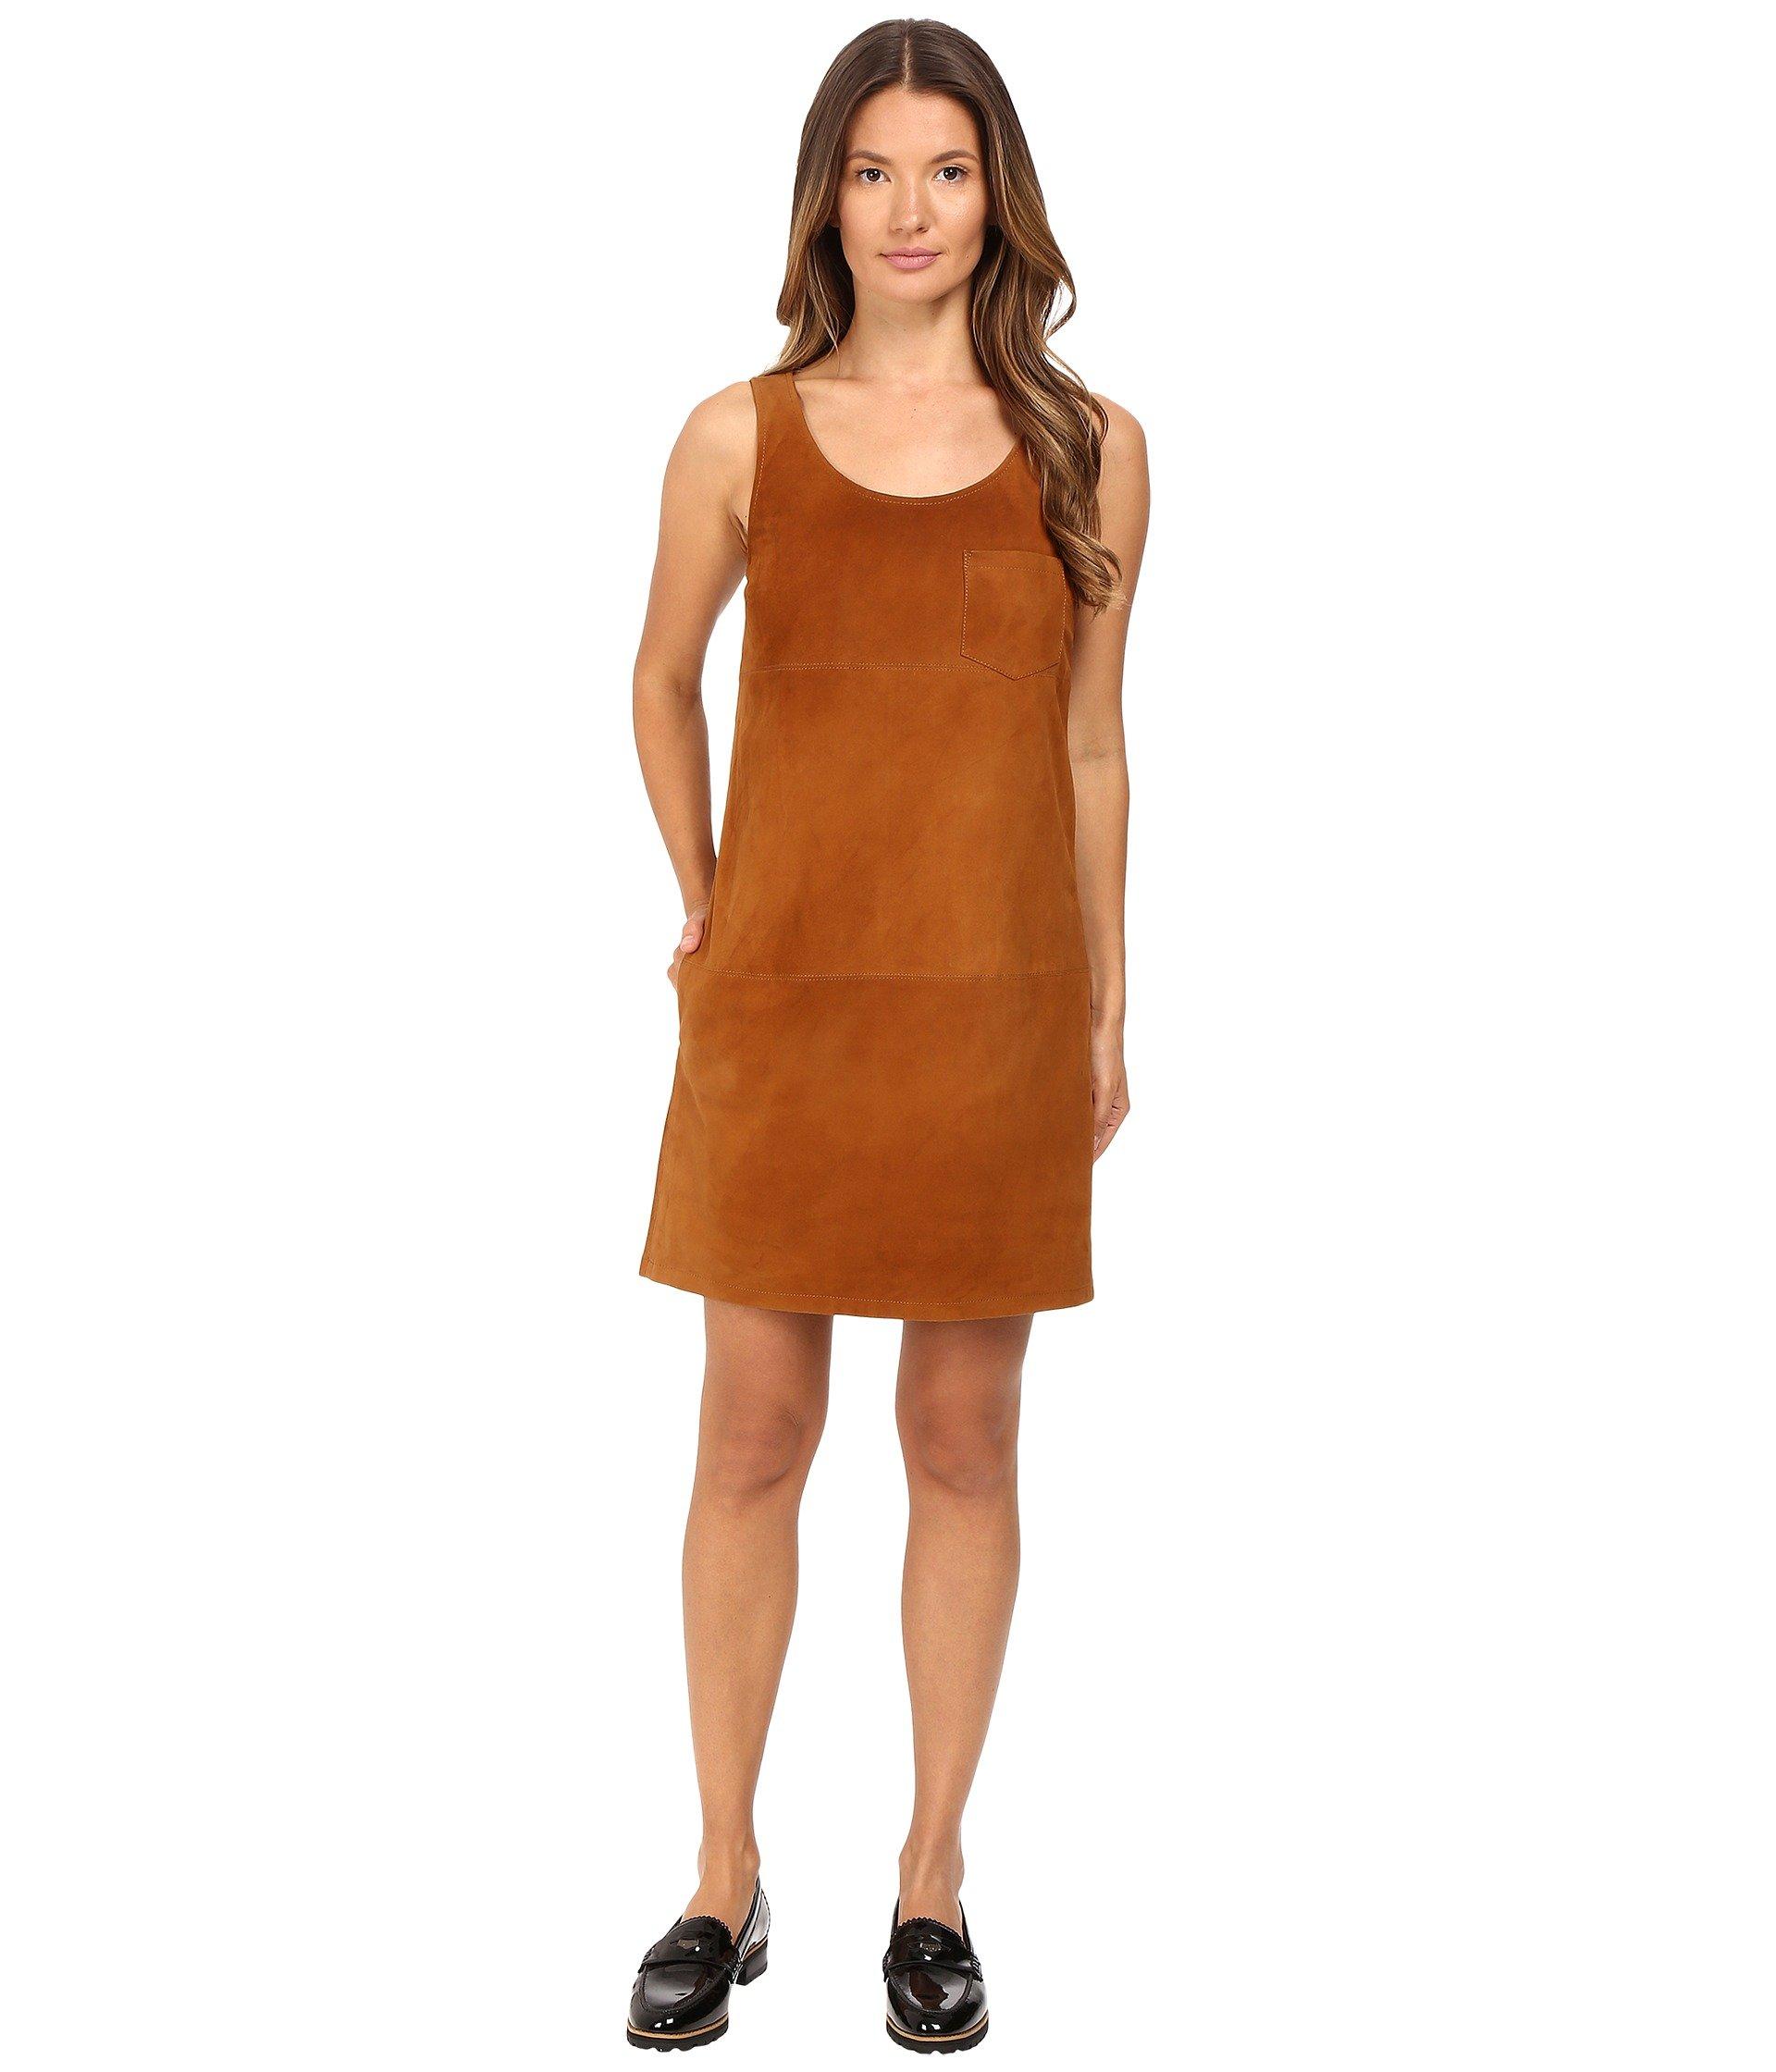 V-Neck Suede Dress